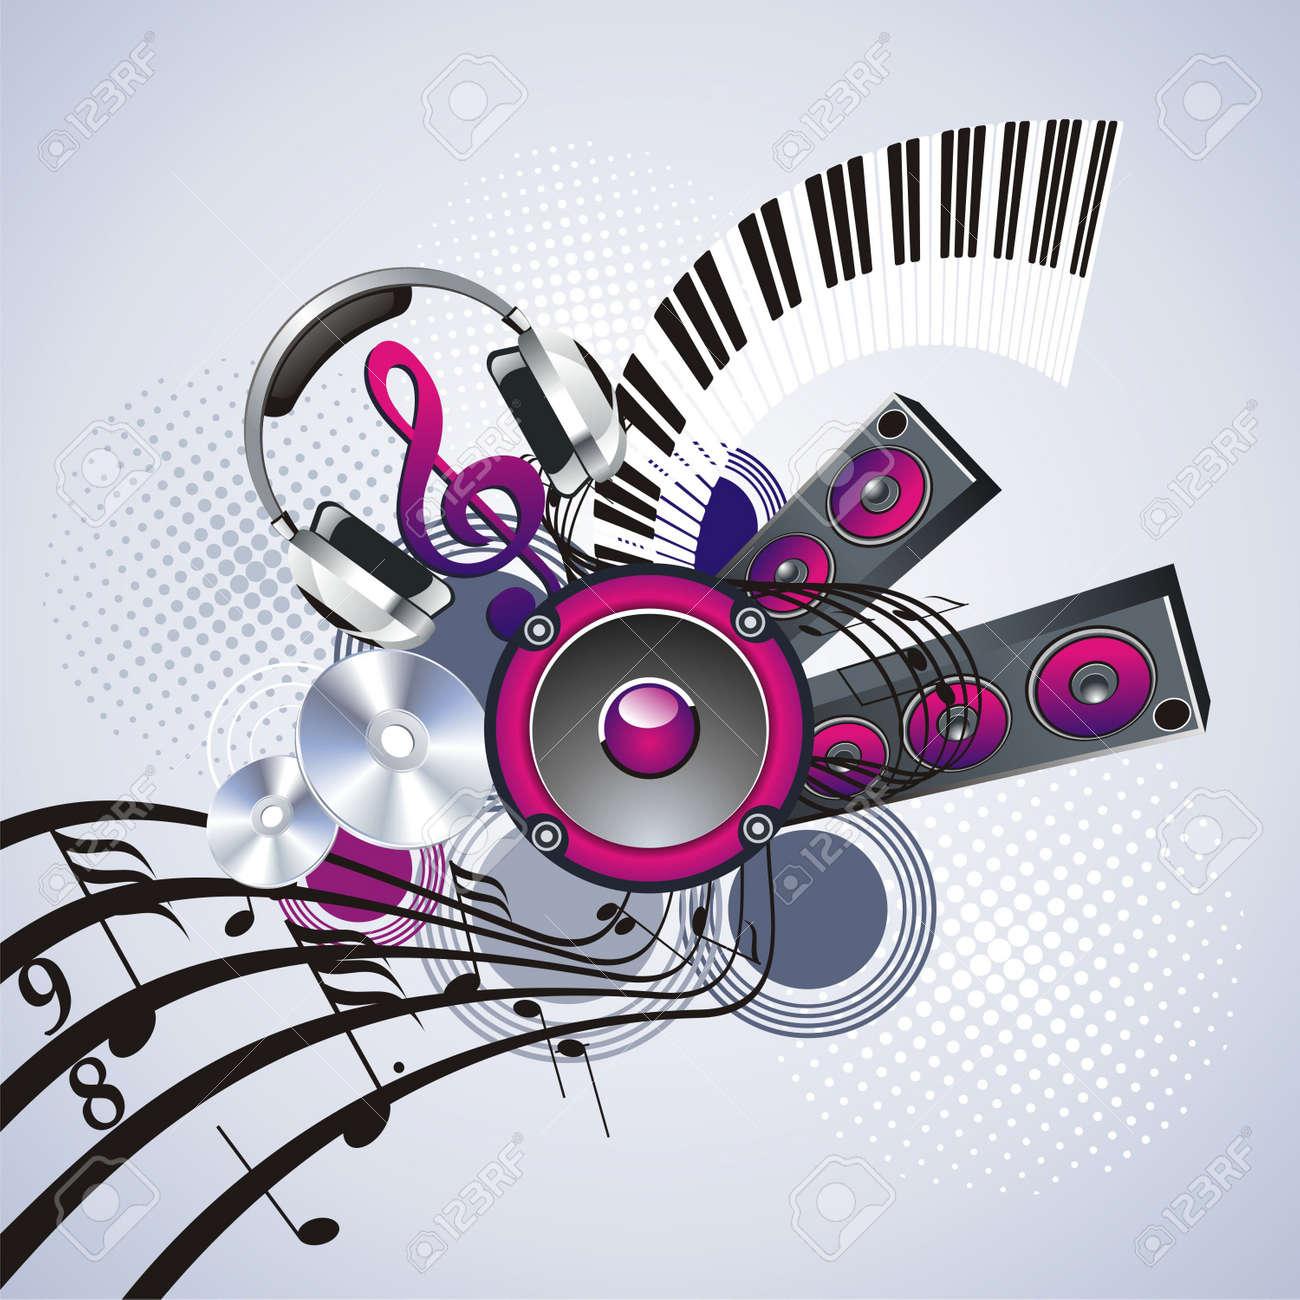 Símbolos Musicales Grunge